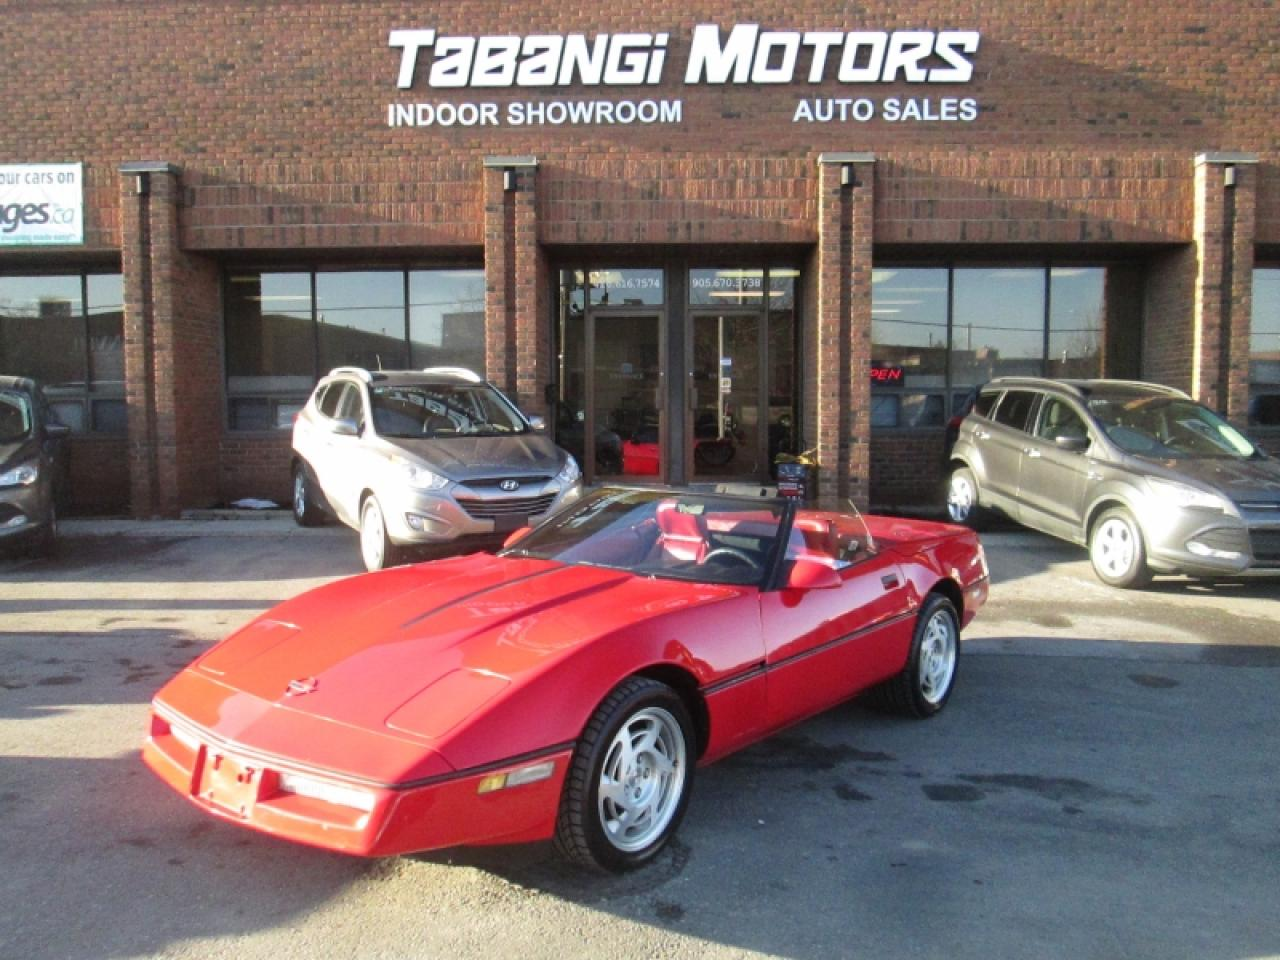 1990 Chevrolet Corvette CONVERTIBLE | LEATHER | 5.7 V8 | SOFT TOP | AUTO